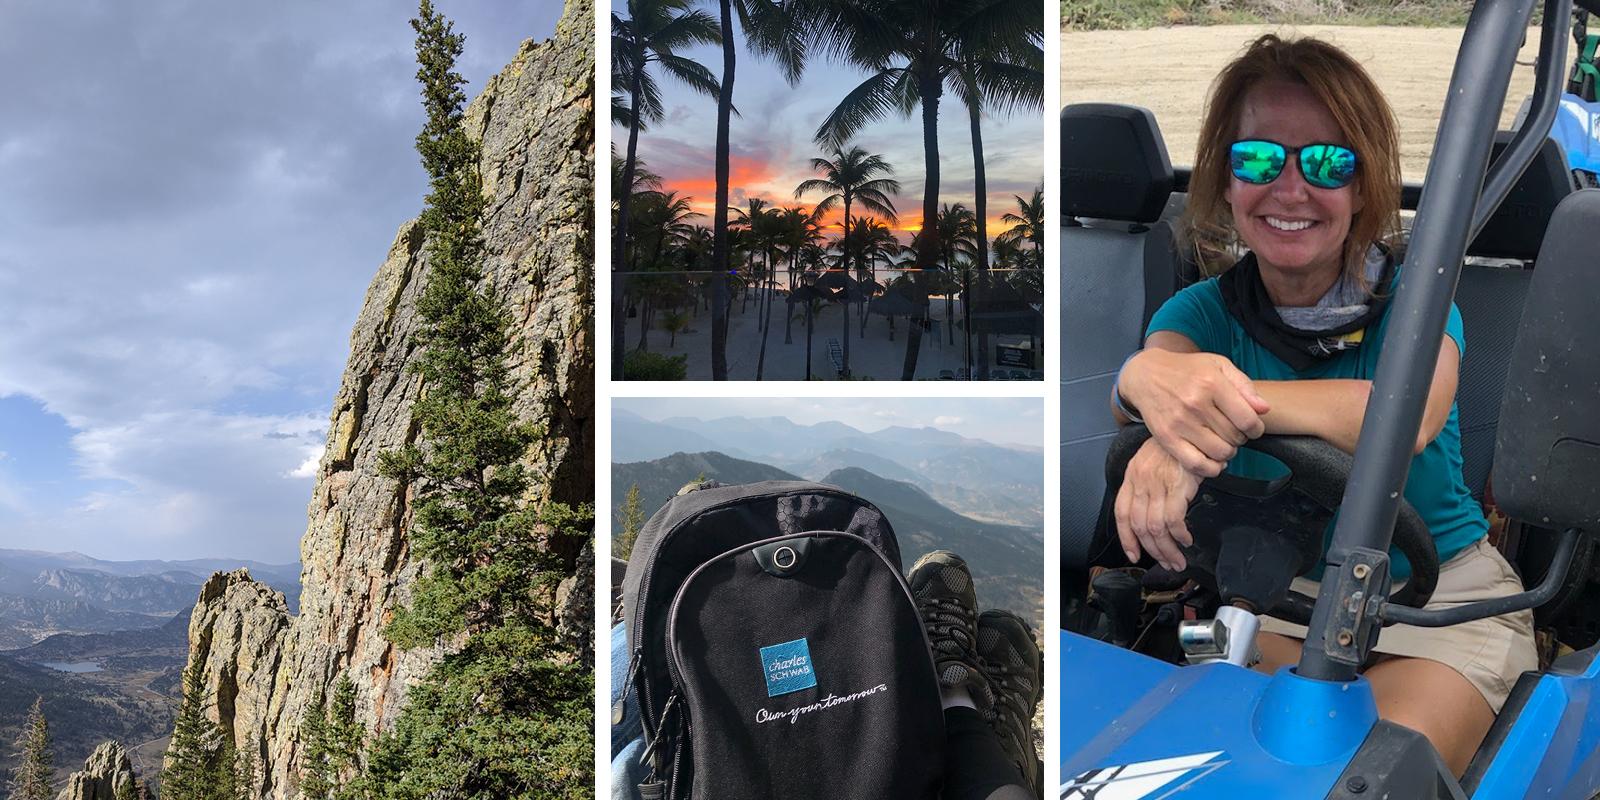 Schwabbie Kristen on her sabbatical with her Schwab backpack and pictures of nature.